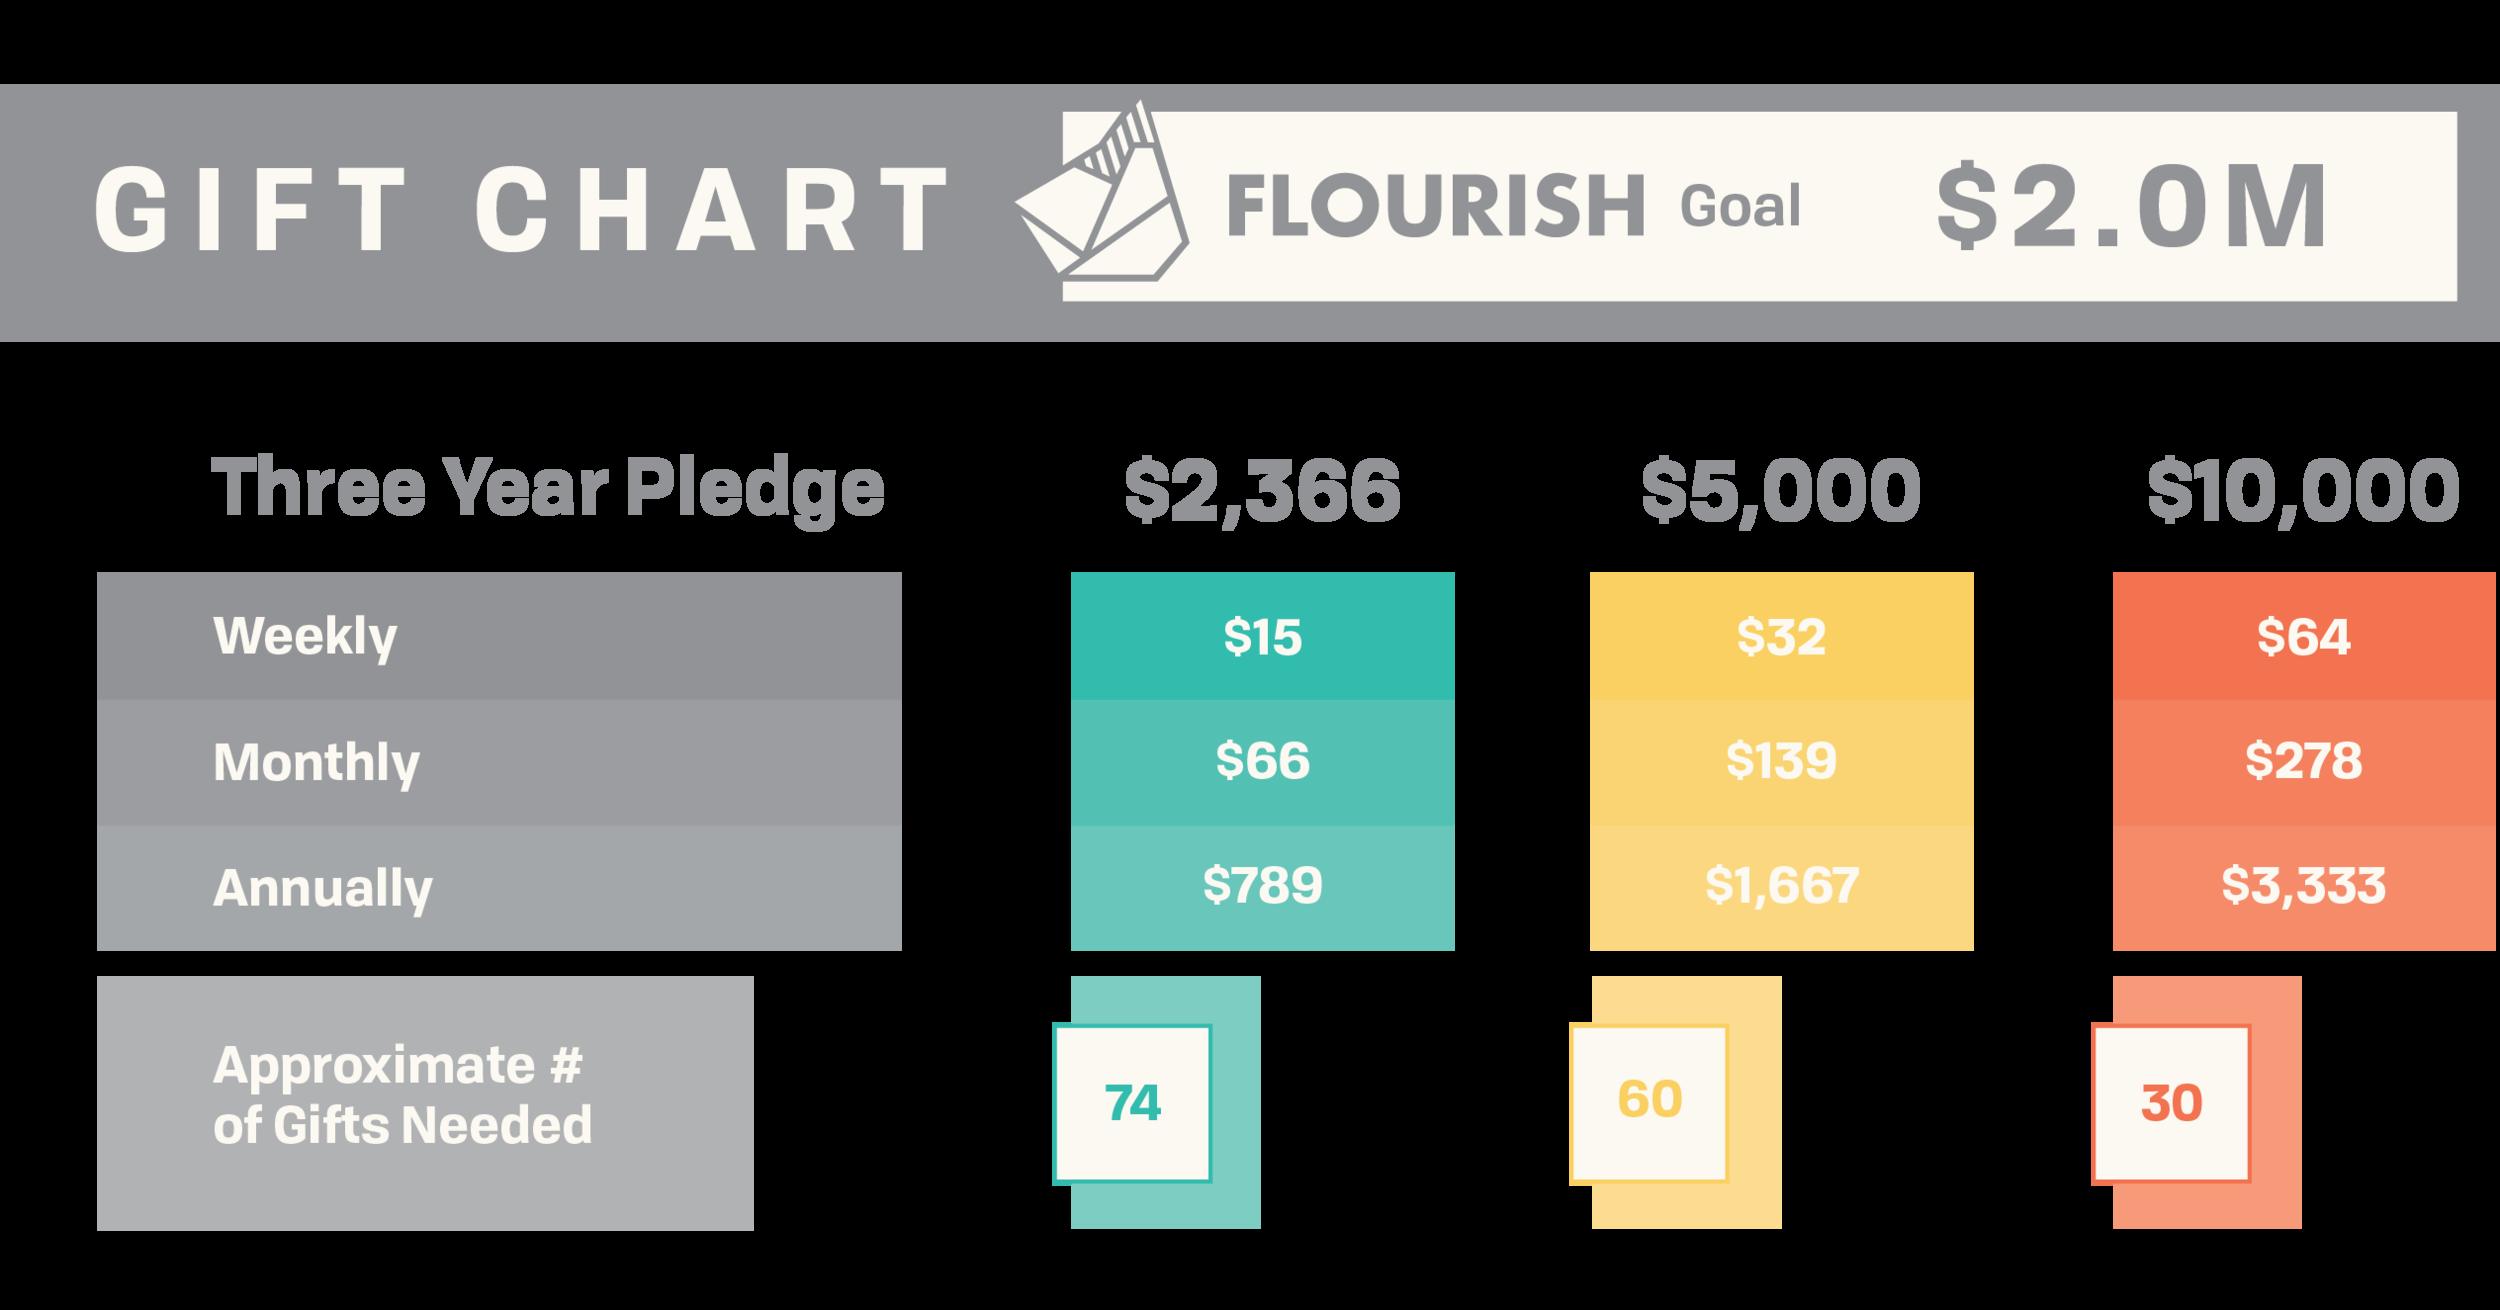 Flourish Giving Chart